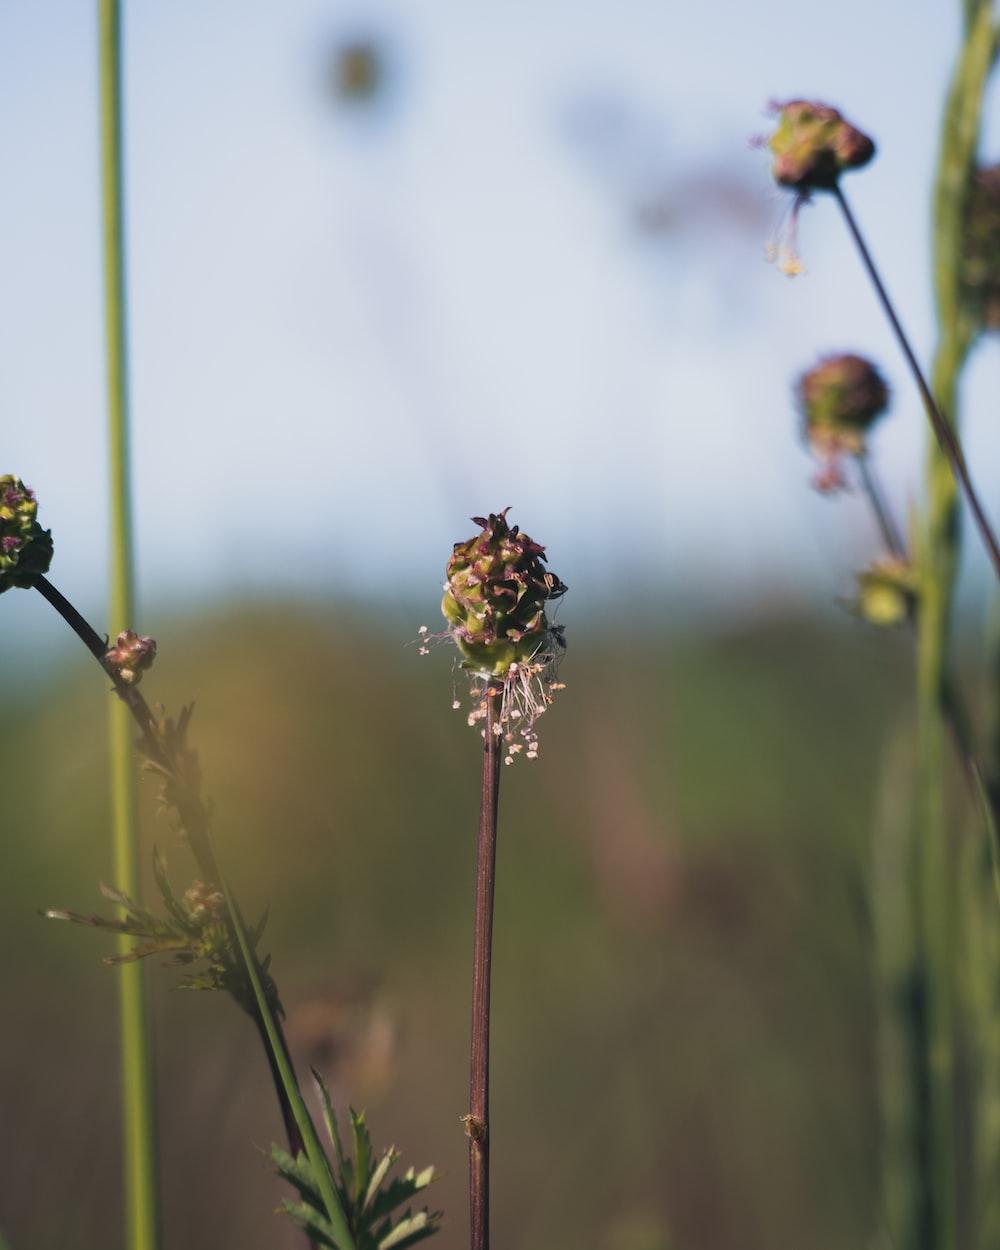 brown and yellow flower in tilt shift lens